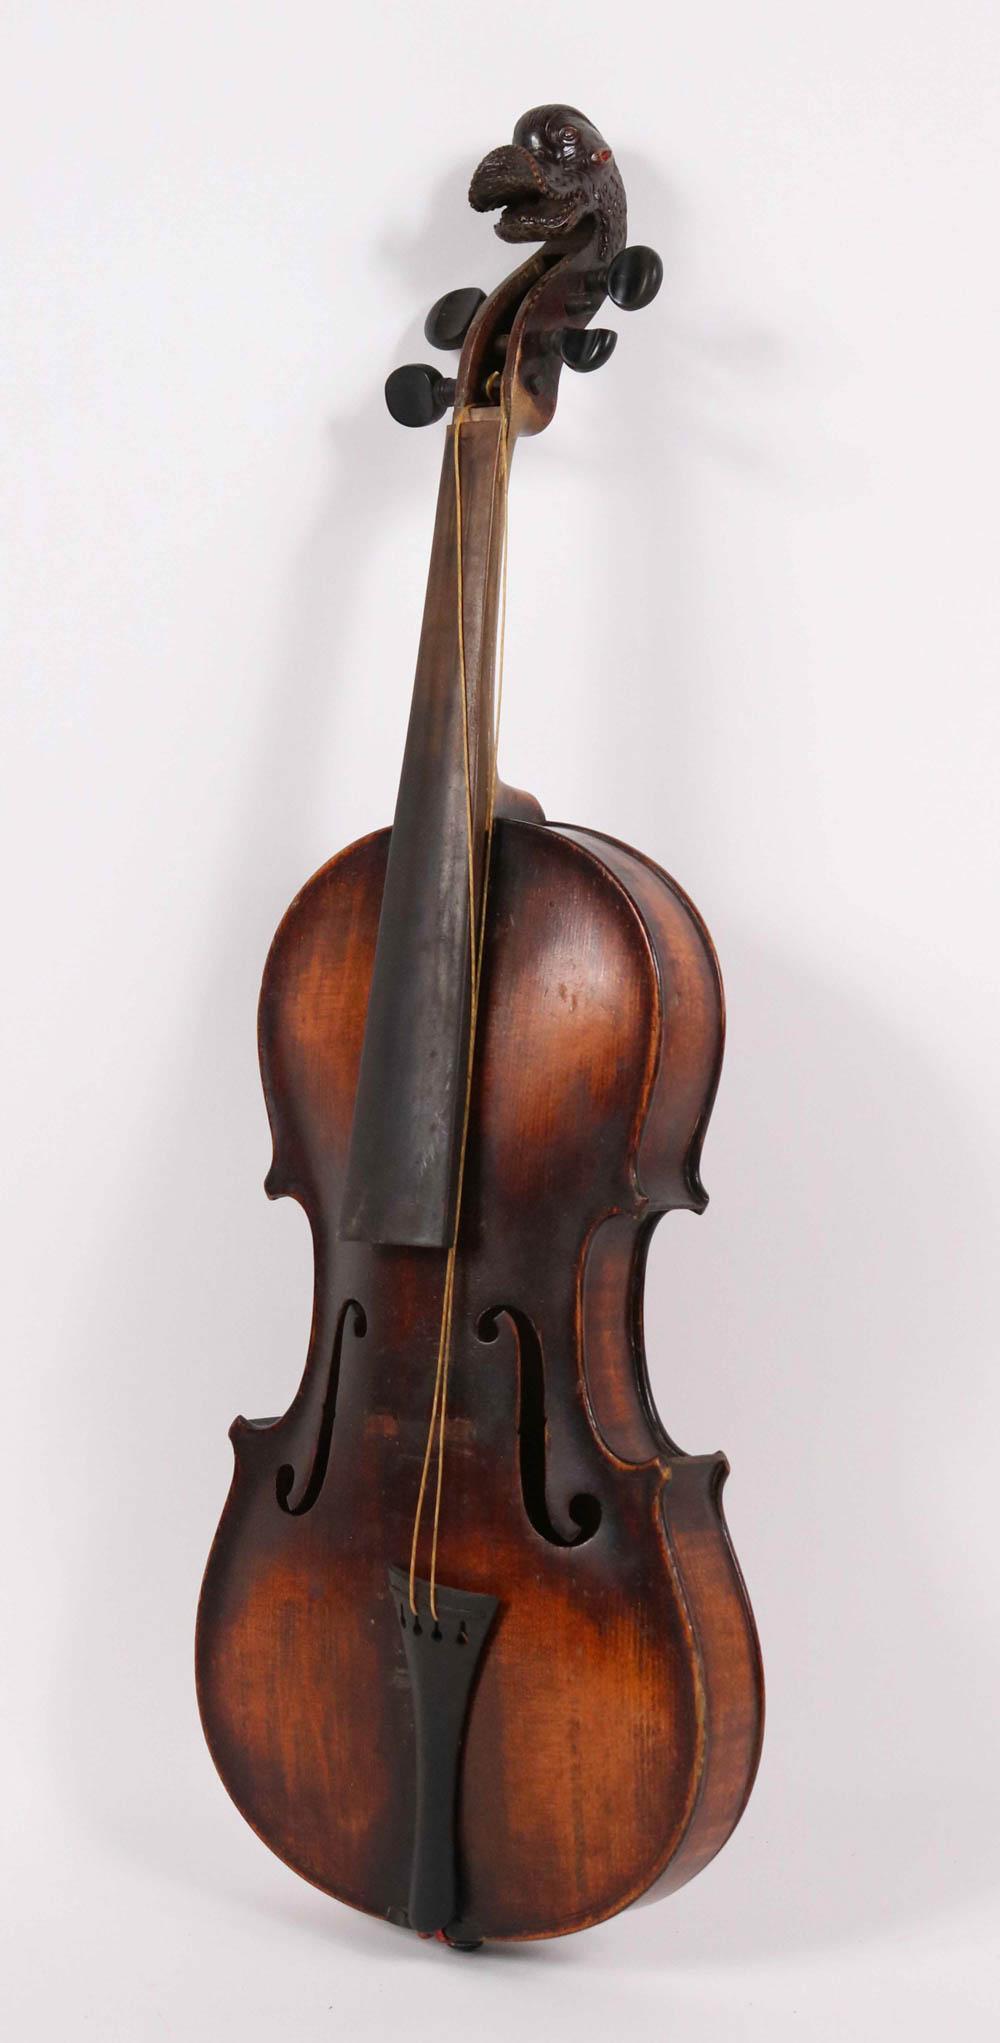 Bohemian, German School Violin, Sea-Monster Head